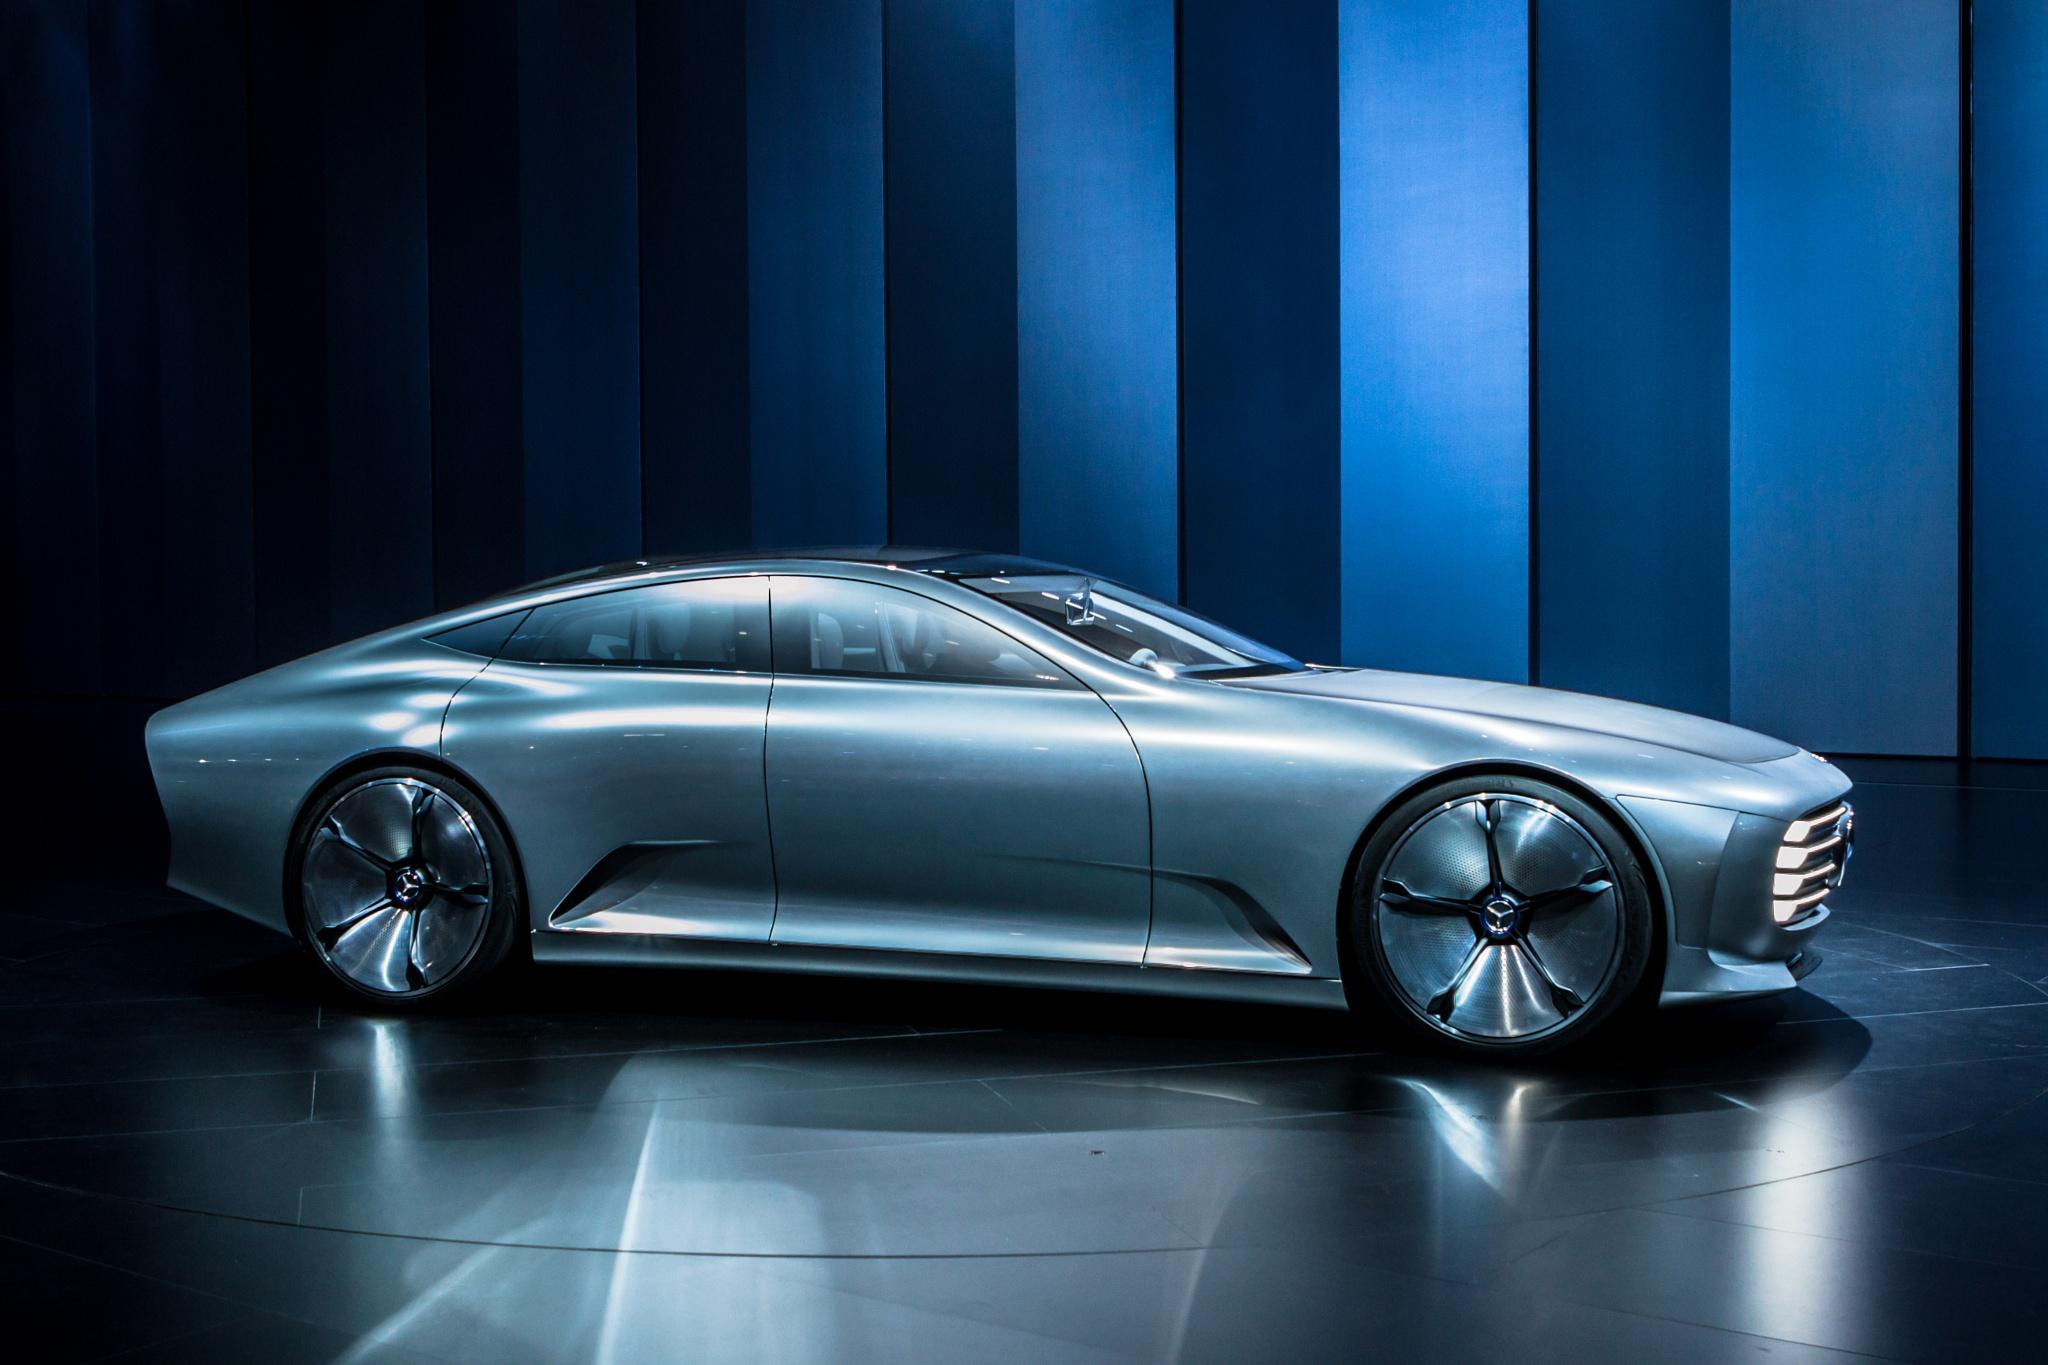 Mercedes Benz Concept Car 2015 by Wanja Wiese